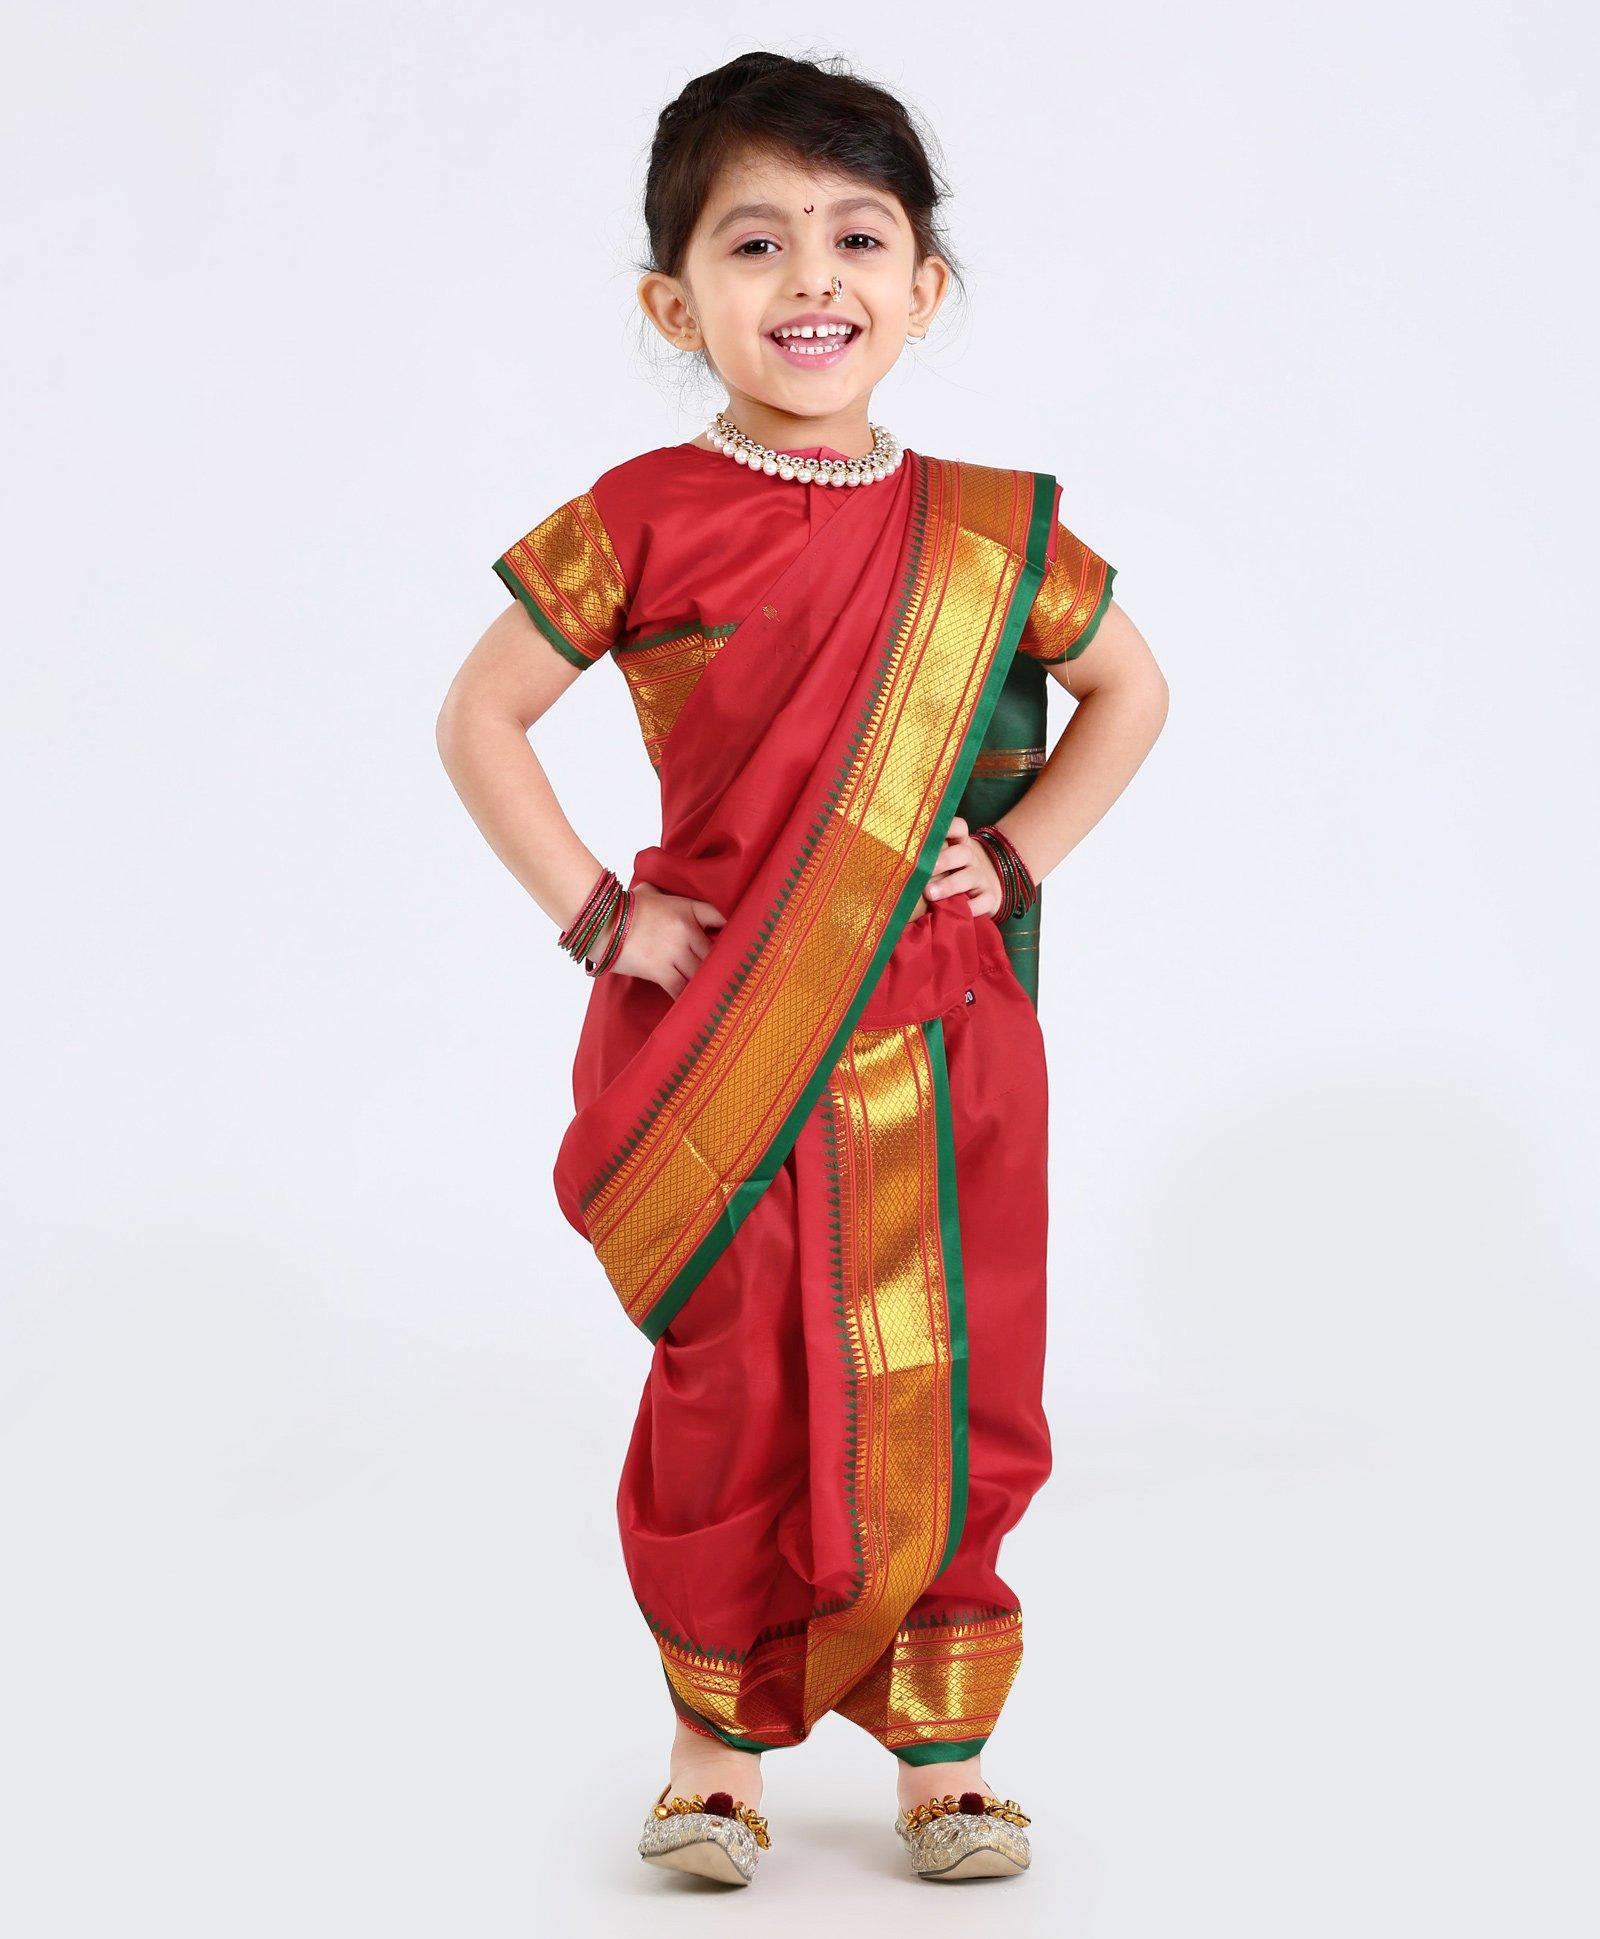 e0135d25dcf669 Buy Bhartiya Half Sleeves Blouse And Nauvari Saree Red for Girls (6 ...